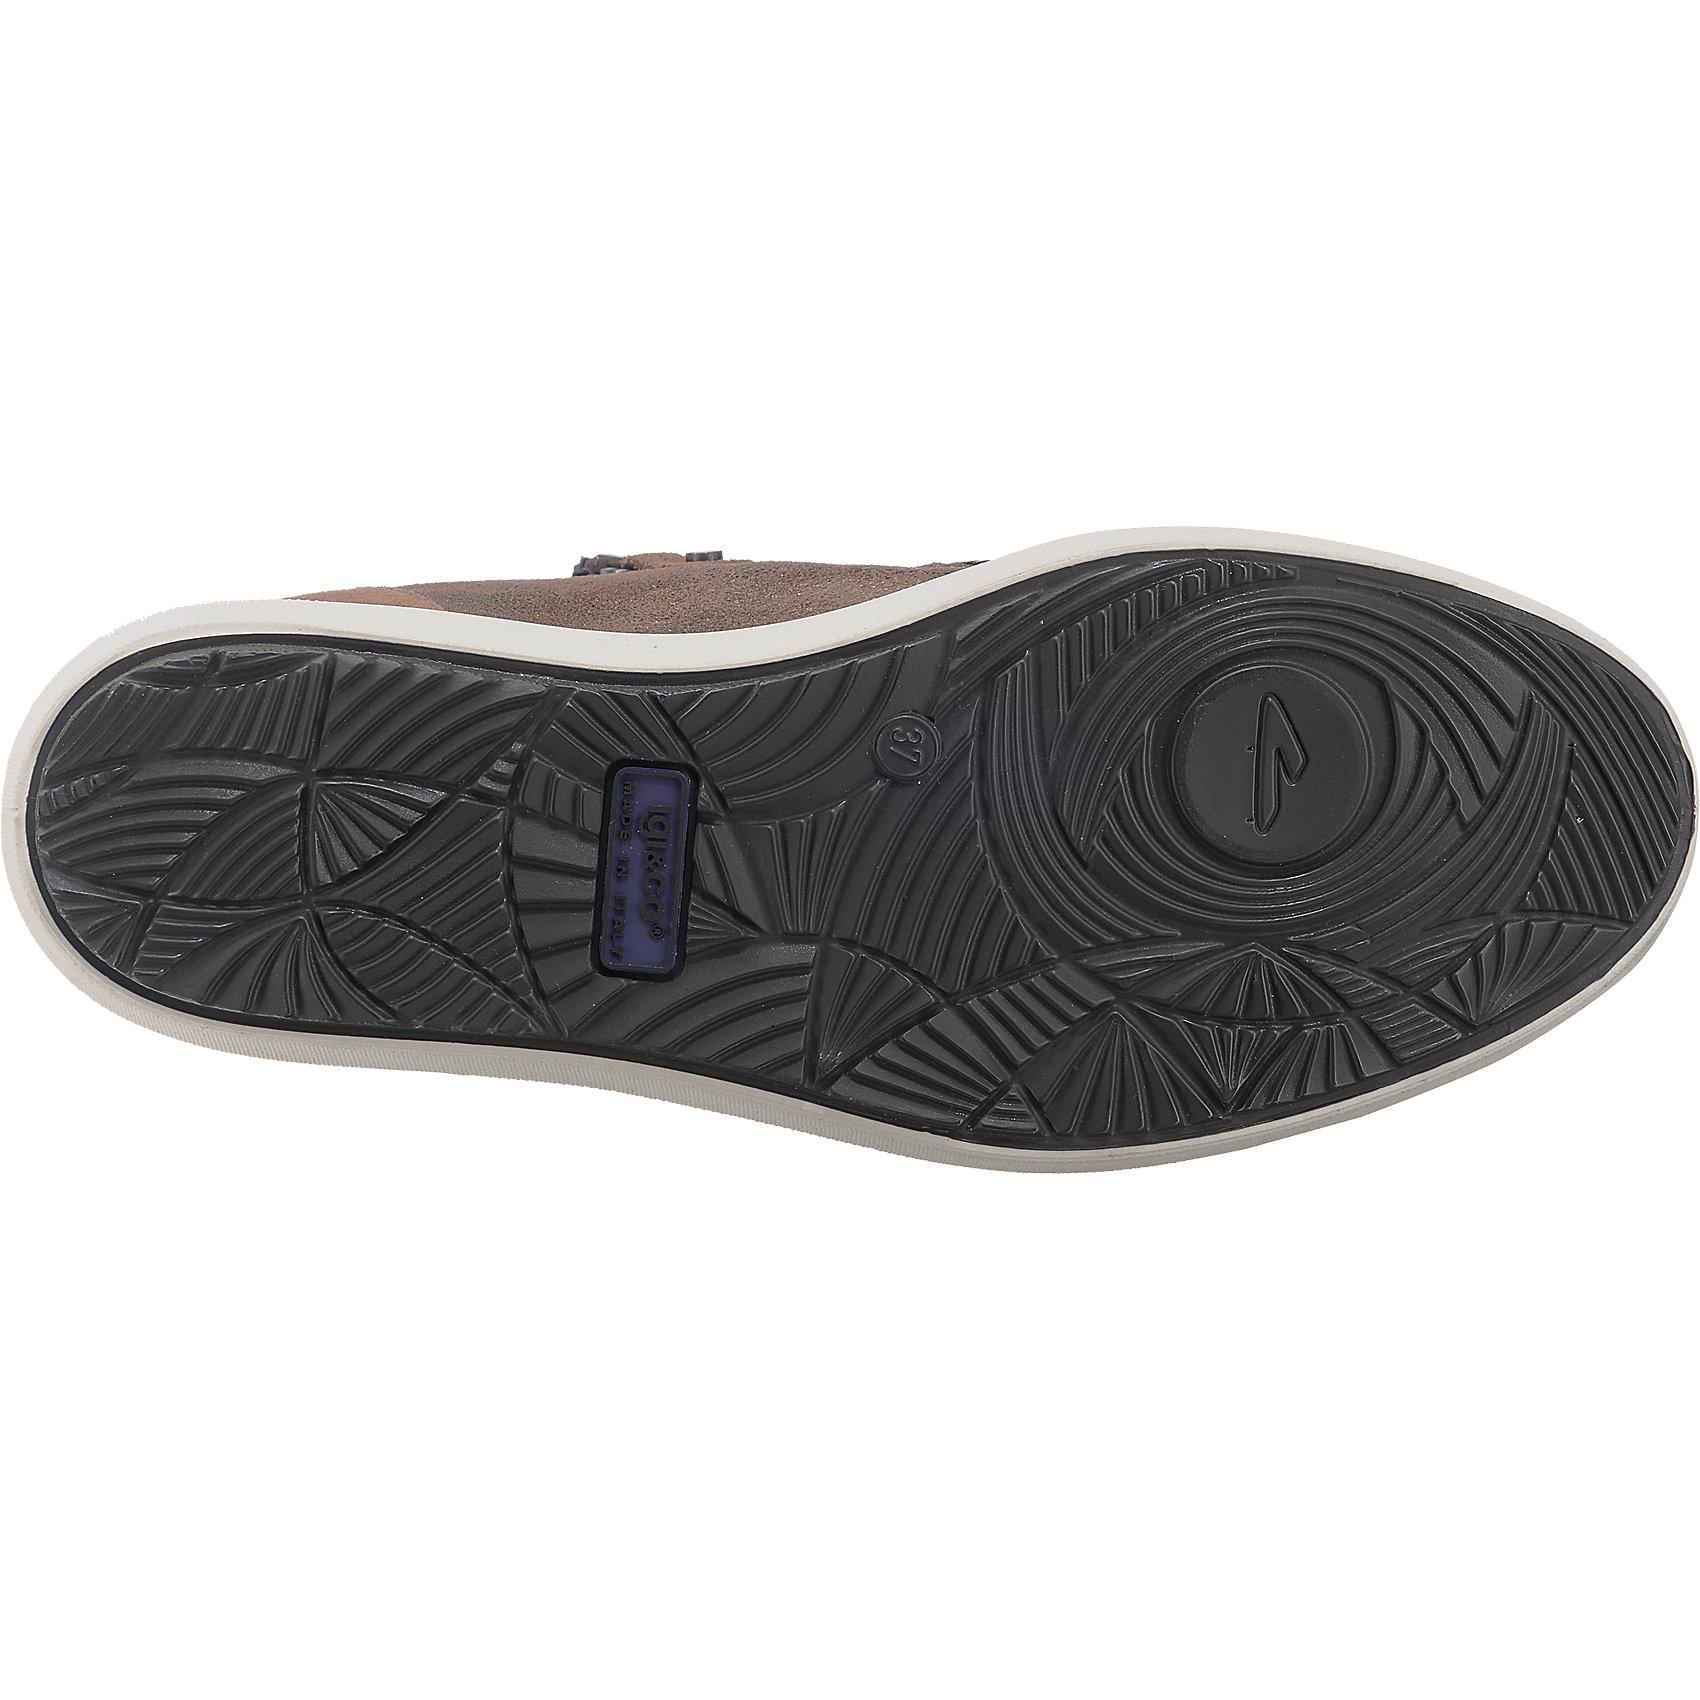 new york 4ecfb fb7d9 ... Nike 654857 Mens Stefan Janoski Low Top Skateboarding Shoes Sneakers  Sneakers Sneakers Black 1615dc ...